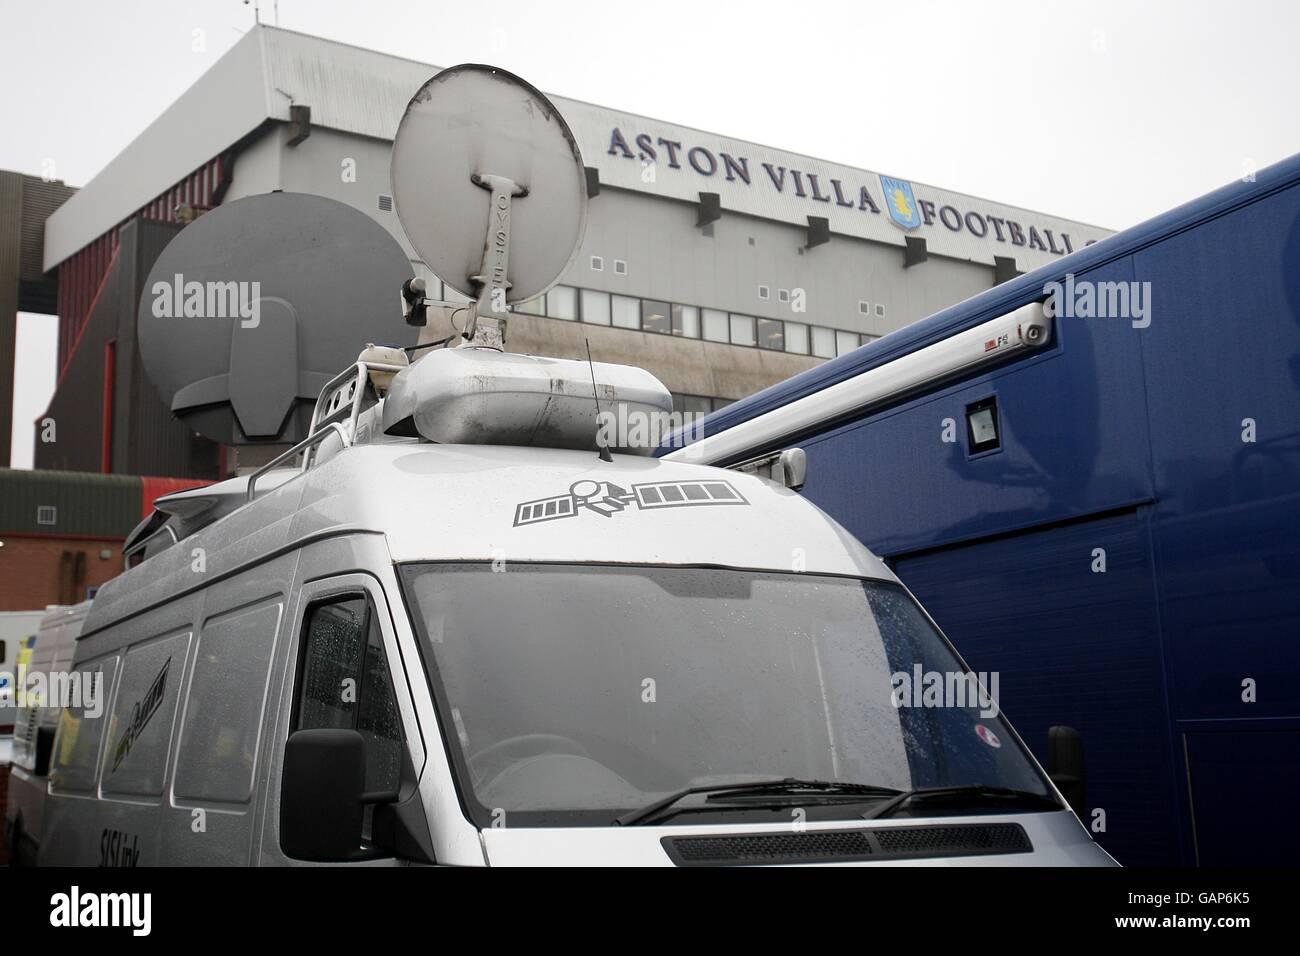 Soccer - Barclays Premier League - Aston Villa v Birmingham City - Villa Park - Stock Image